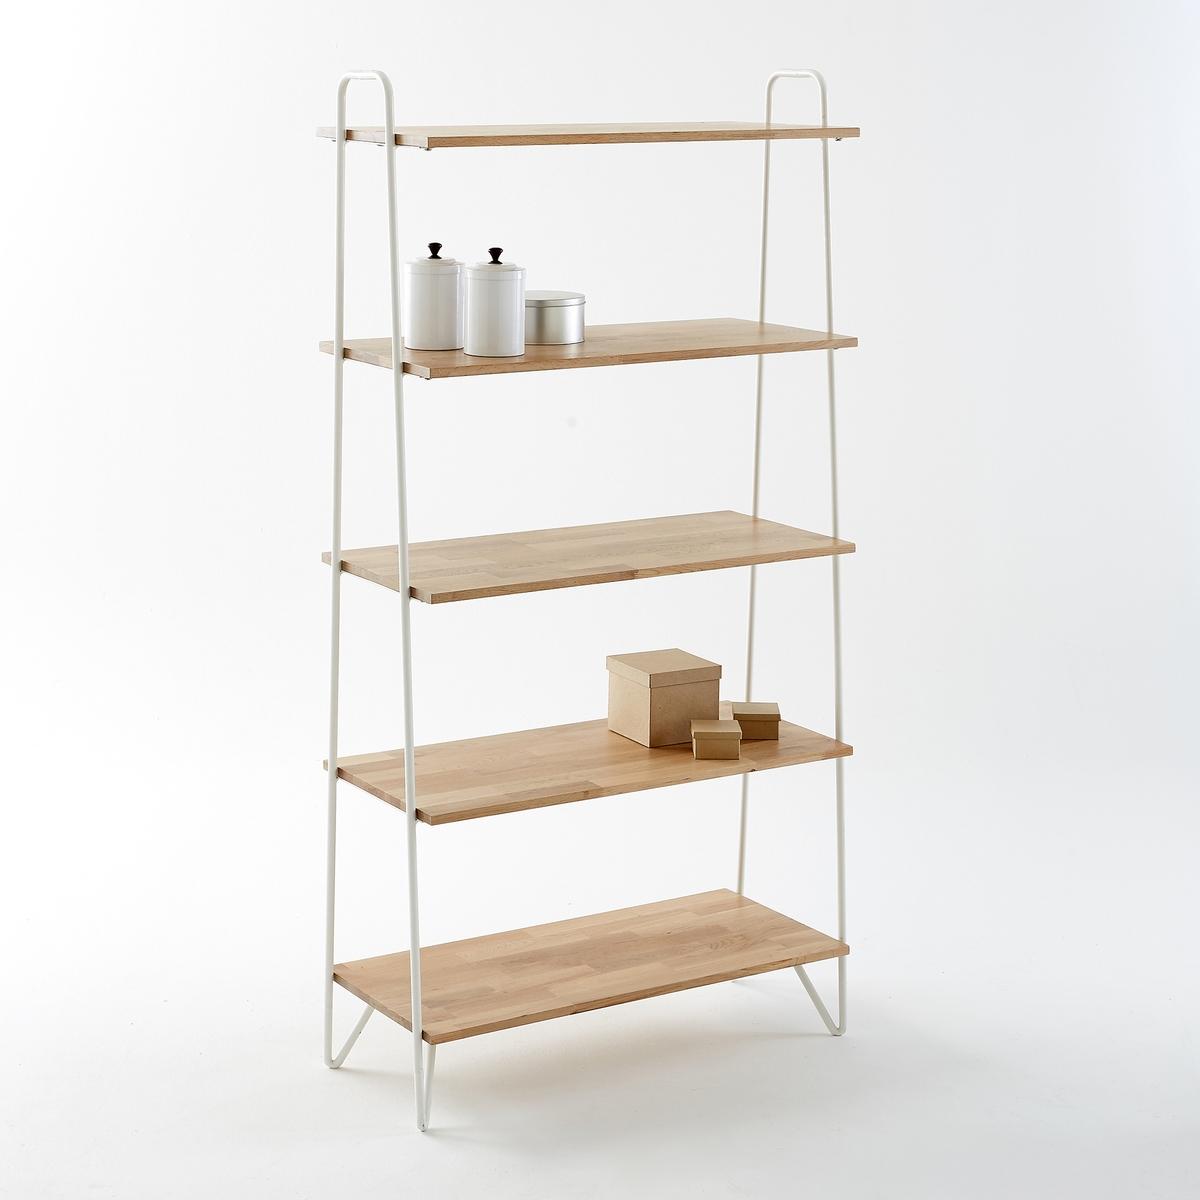 Этажерка из металла и дуба, Adza этажерка модульная с 2 ящиками из массива дуба edgar